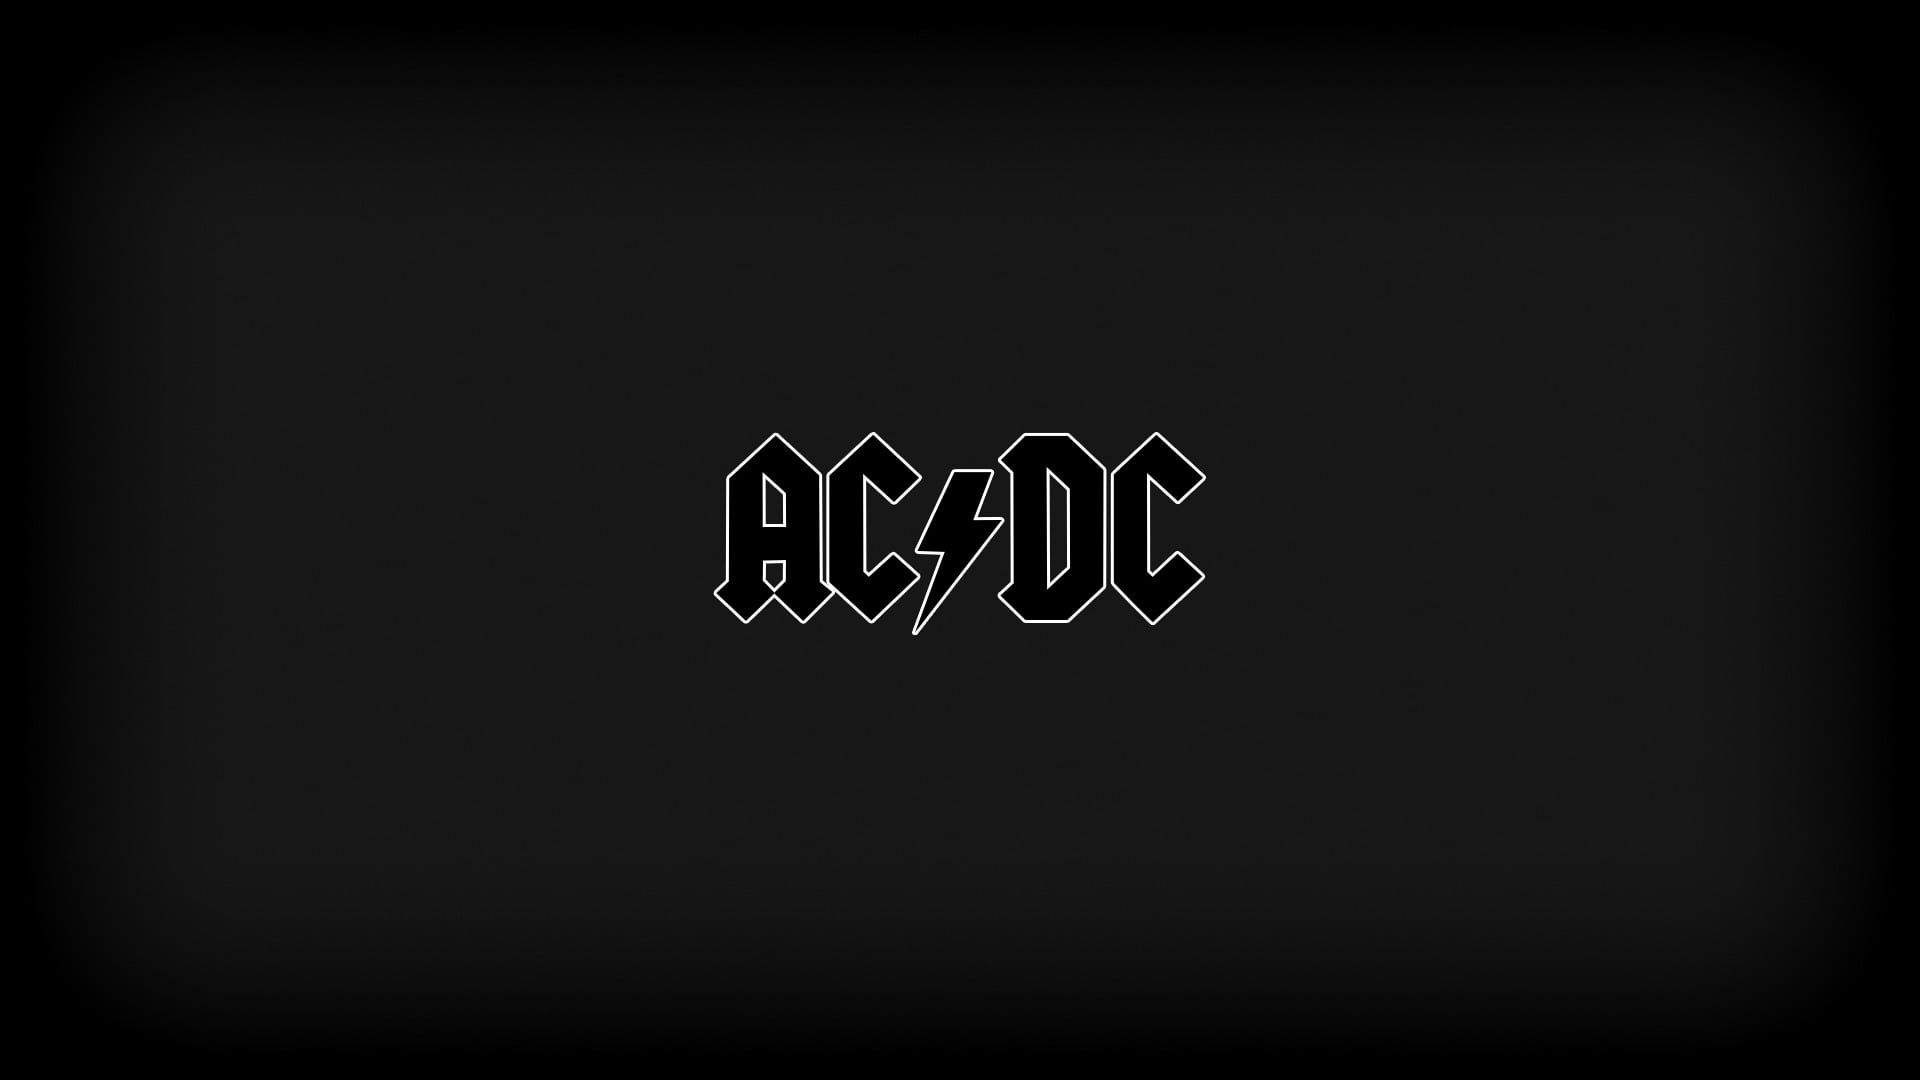 Ac Dc Logo On Black Background Acdc Ac Dc Rock 1080p